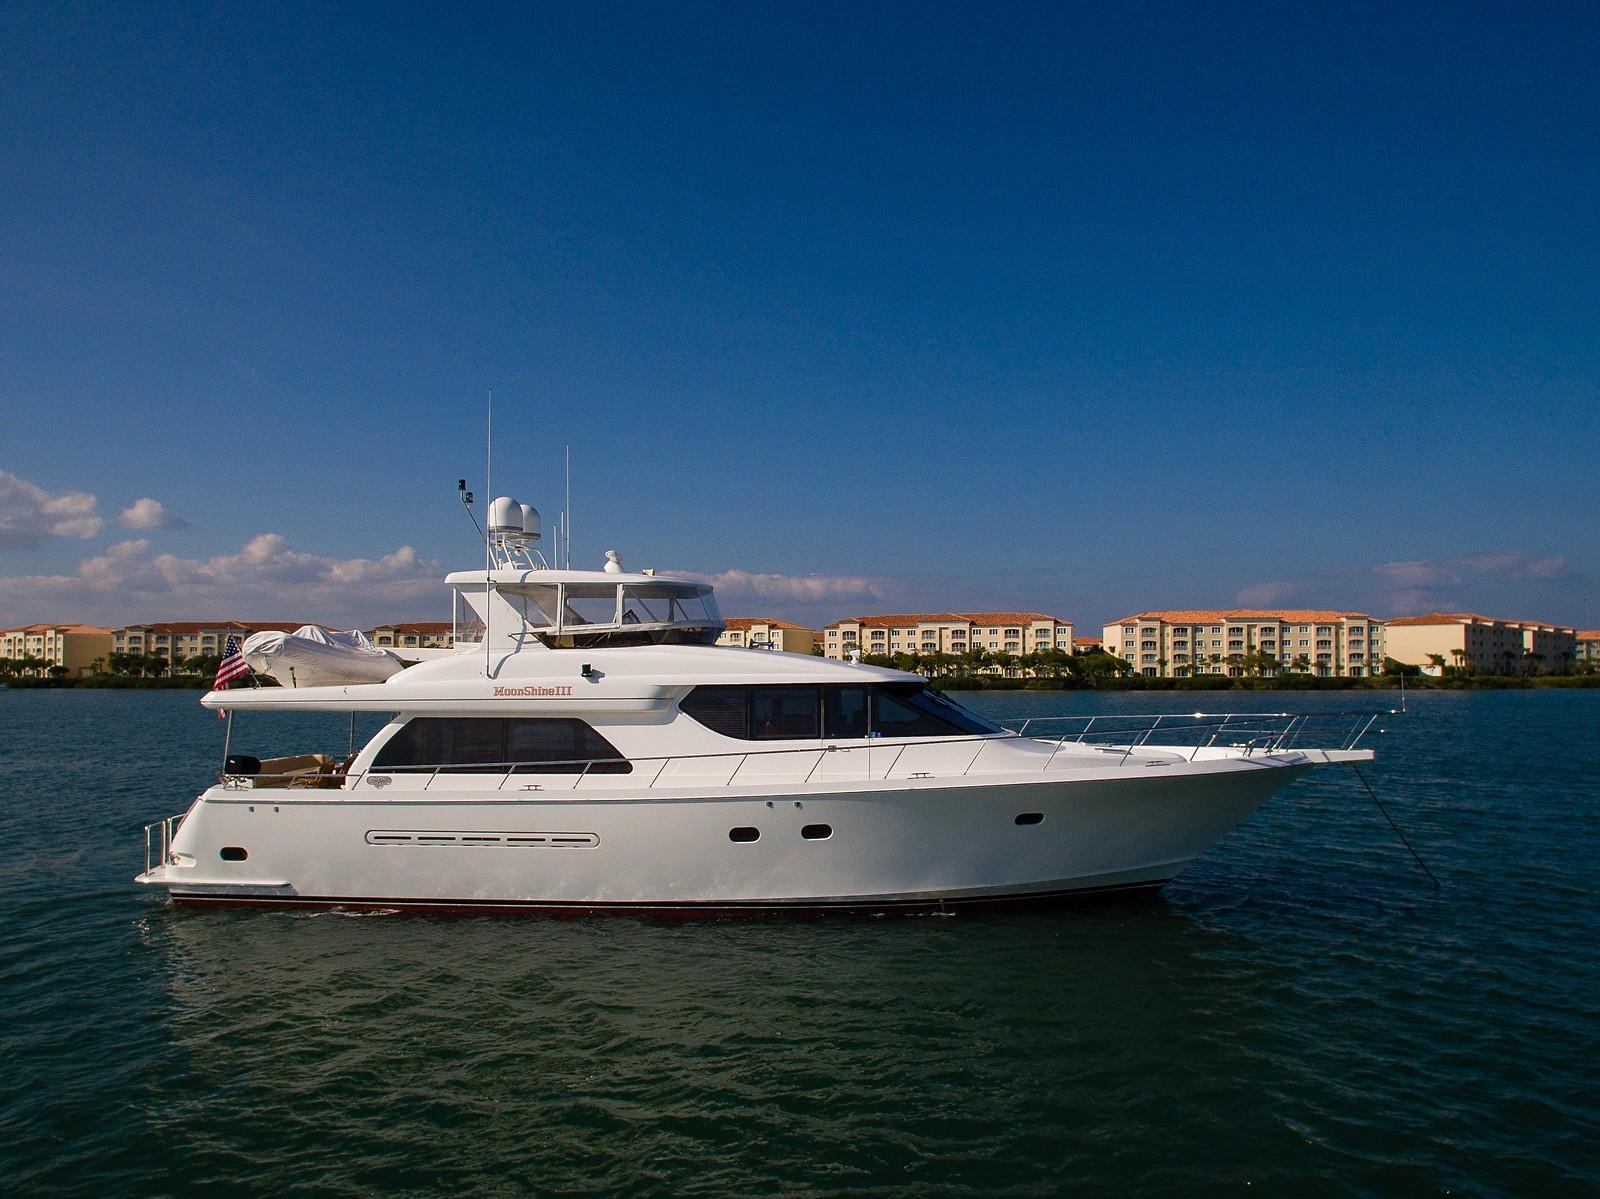 68 West Bay Yacht